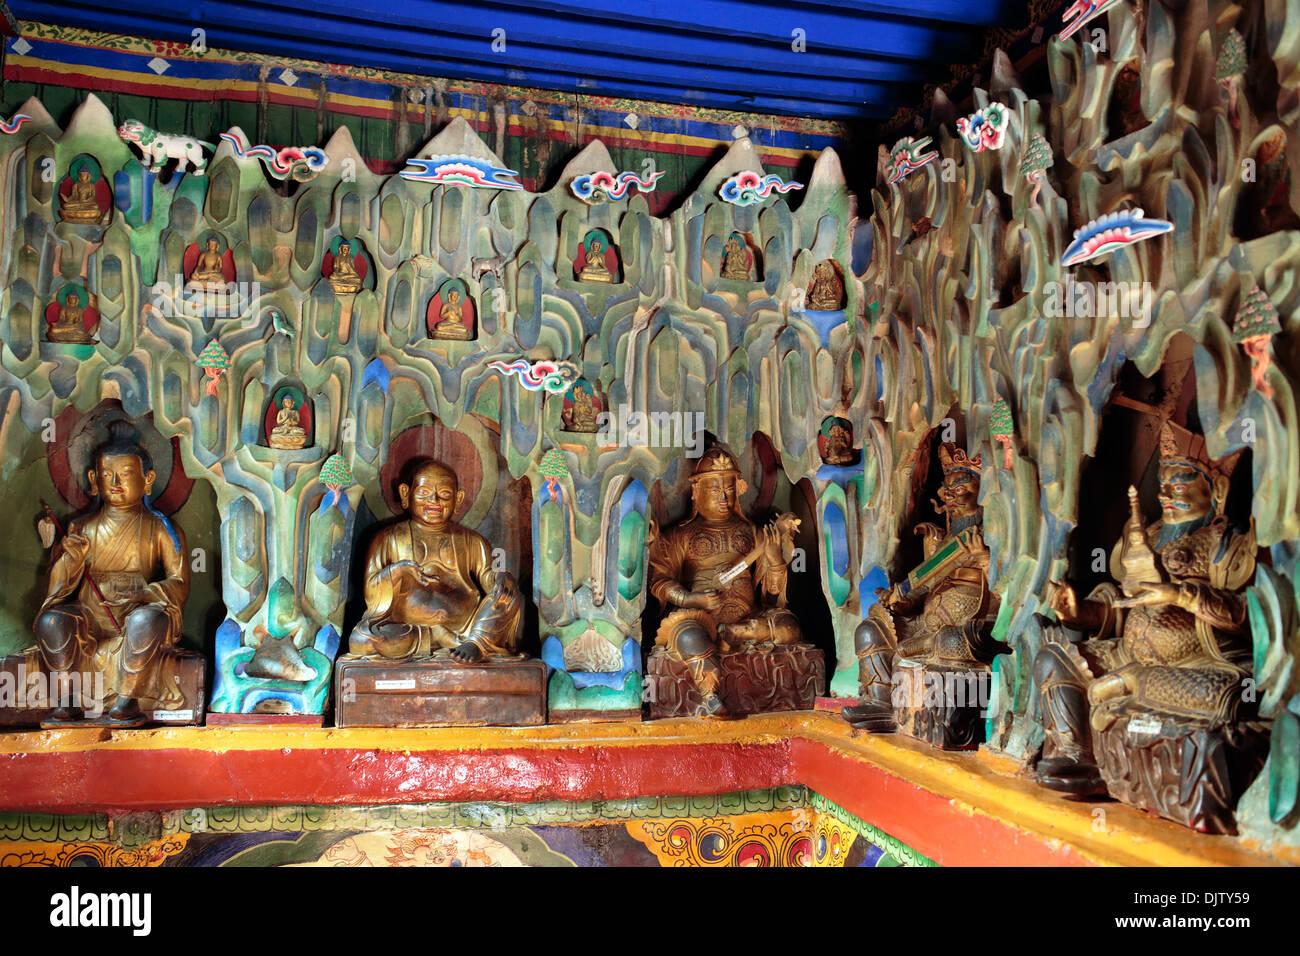 Statue of Green Tara, Main temple, Palcho Monastery, Tibet, China - Stock Image